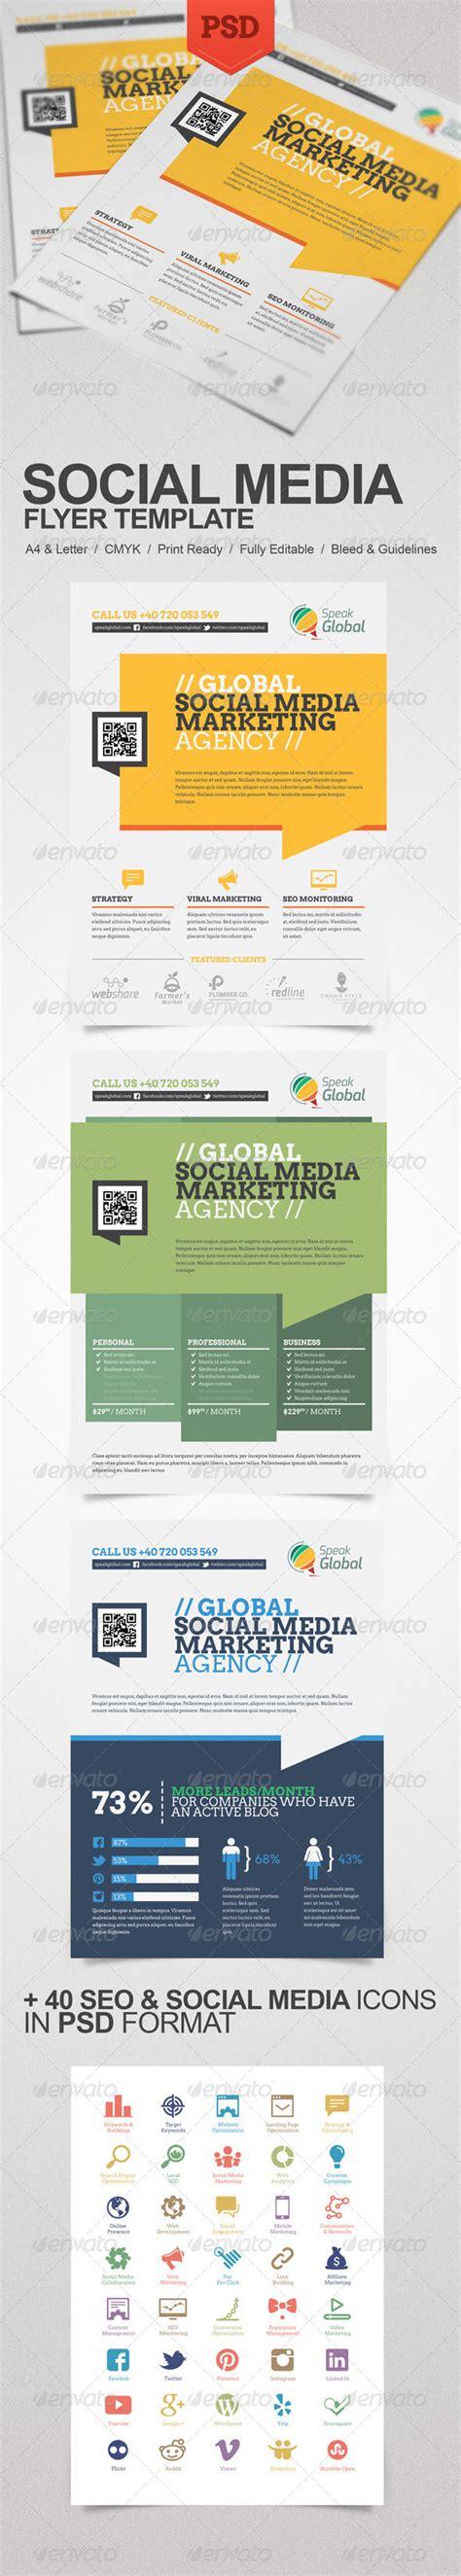 print media templates social media marketing flyer print ad templates